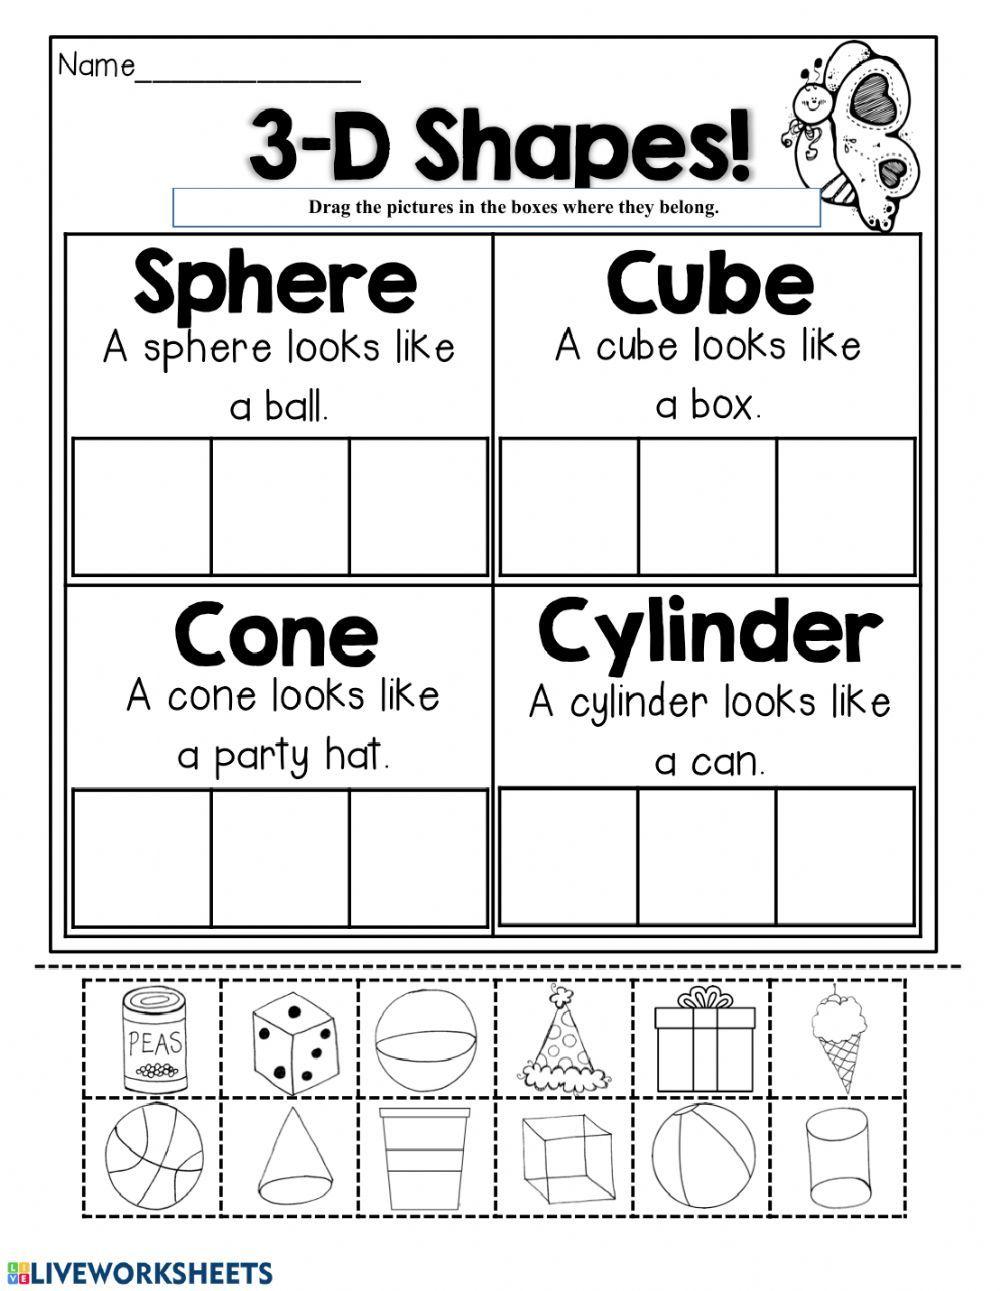 Solid shapes - Interactive worksheet   Shapes worksheets [ 1291 x 1000 Pixel ]